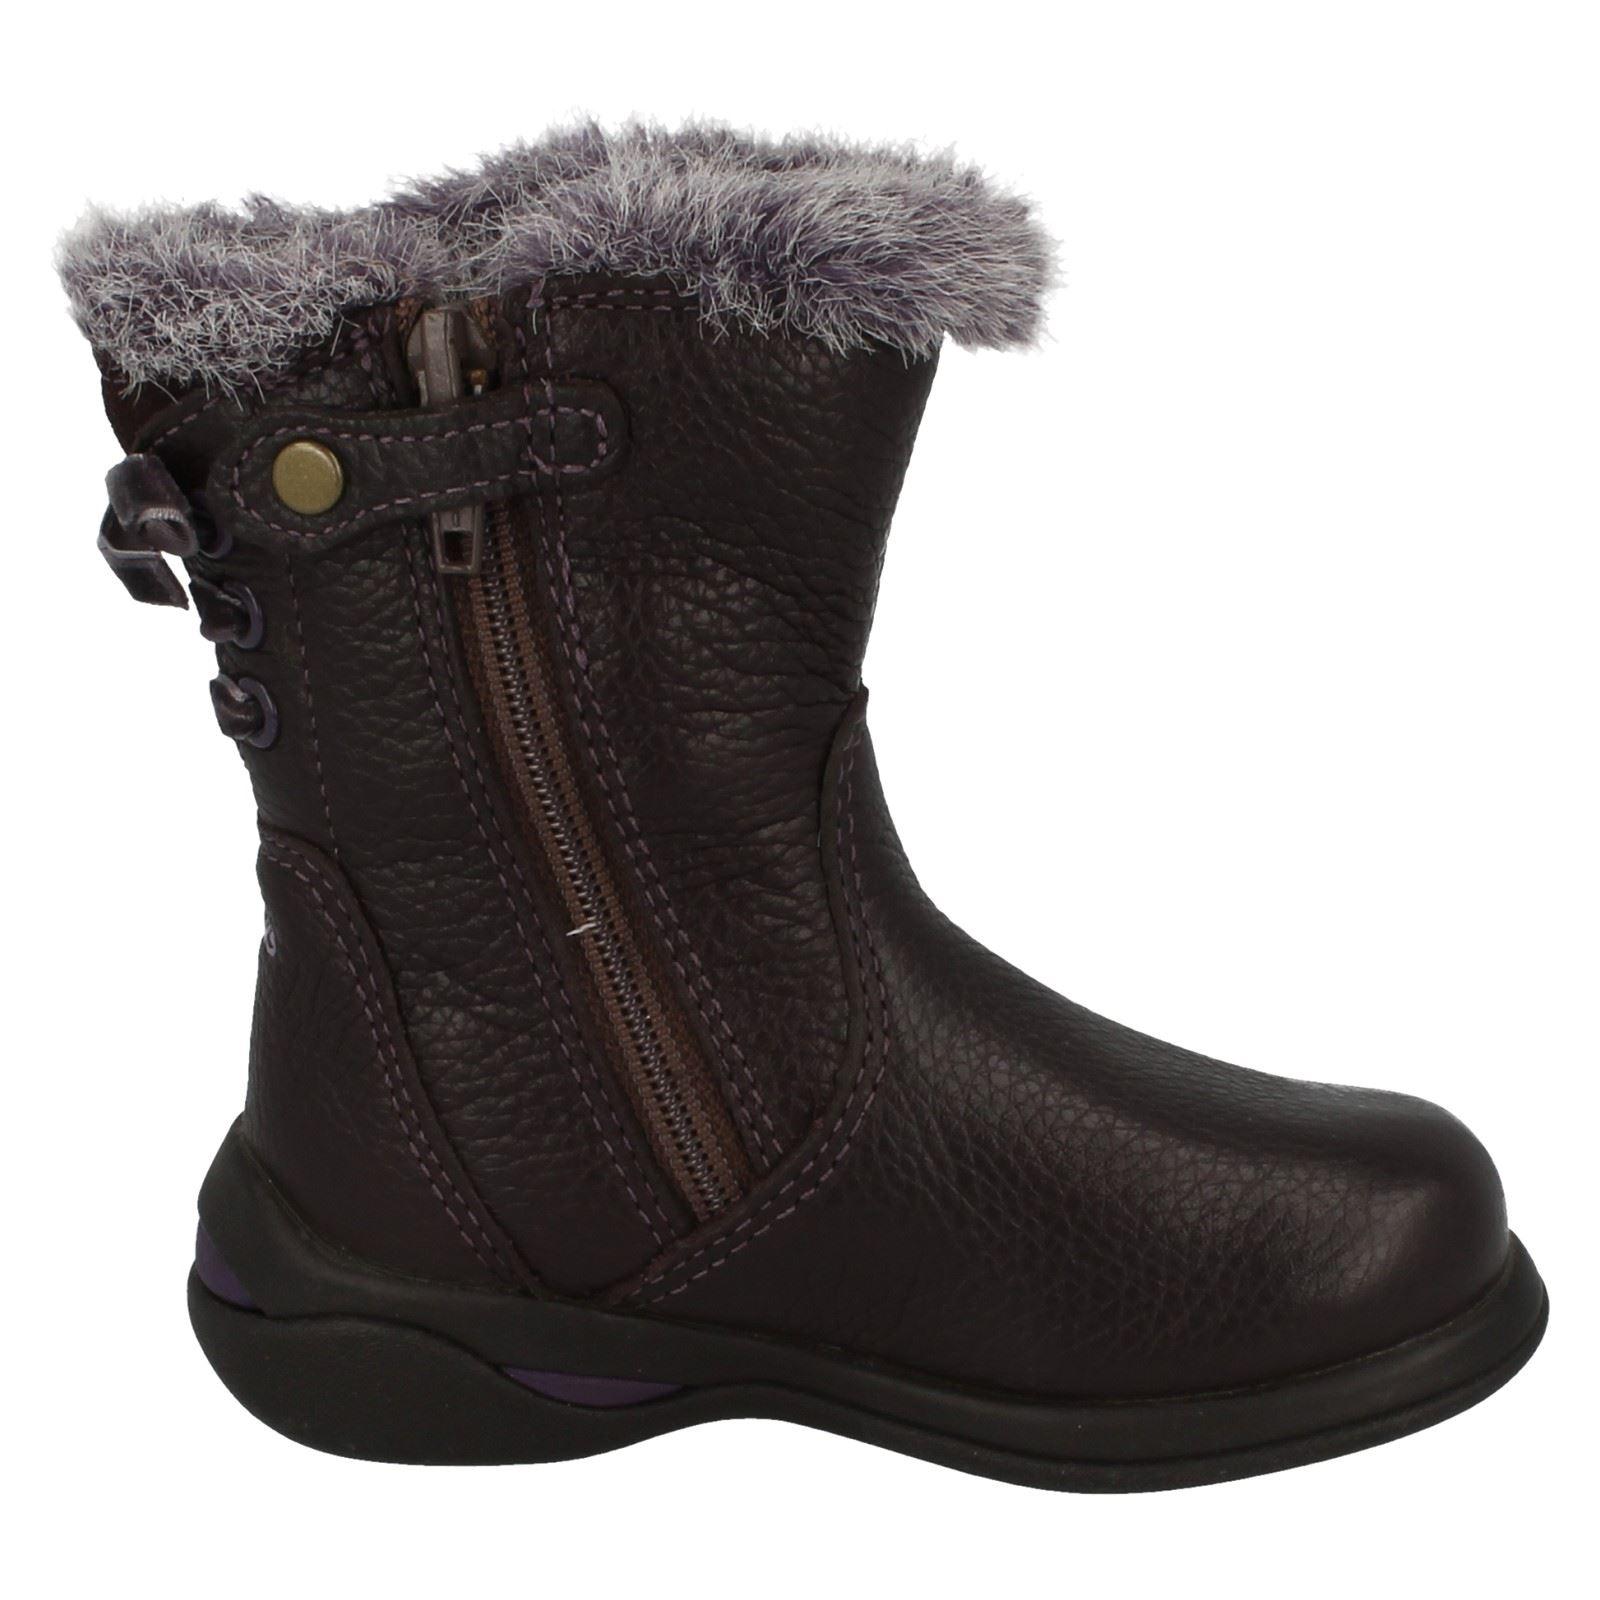 Clarks Boots Ciruela Everyday Girls Lace púrpura Gtx Ice zqw7vAz